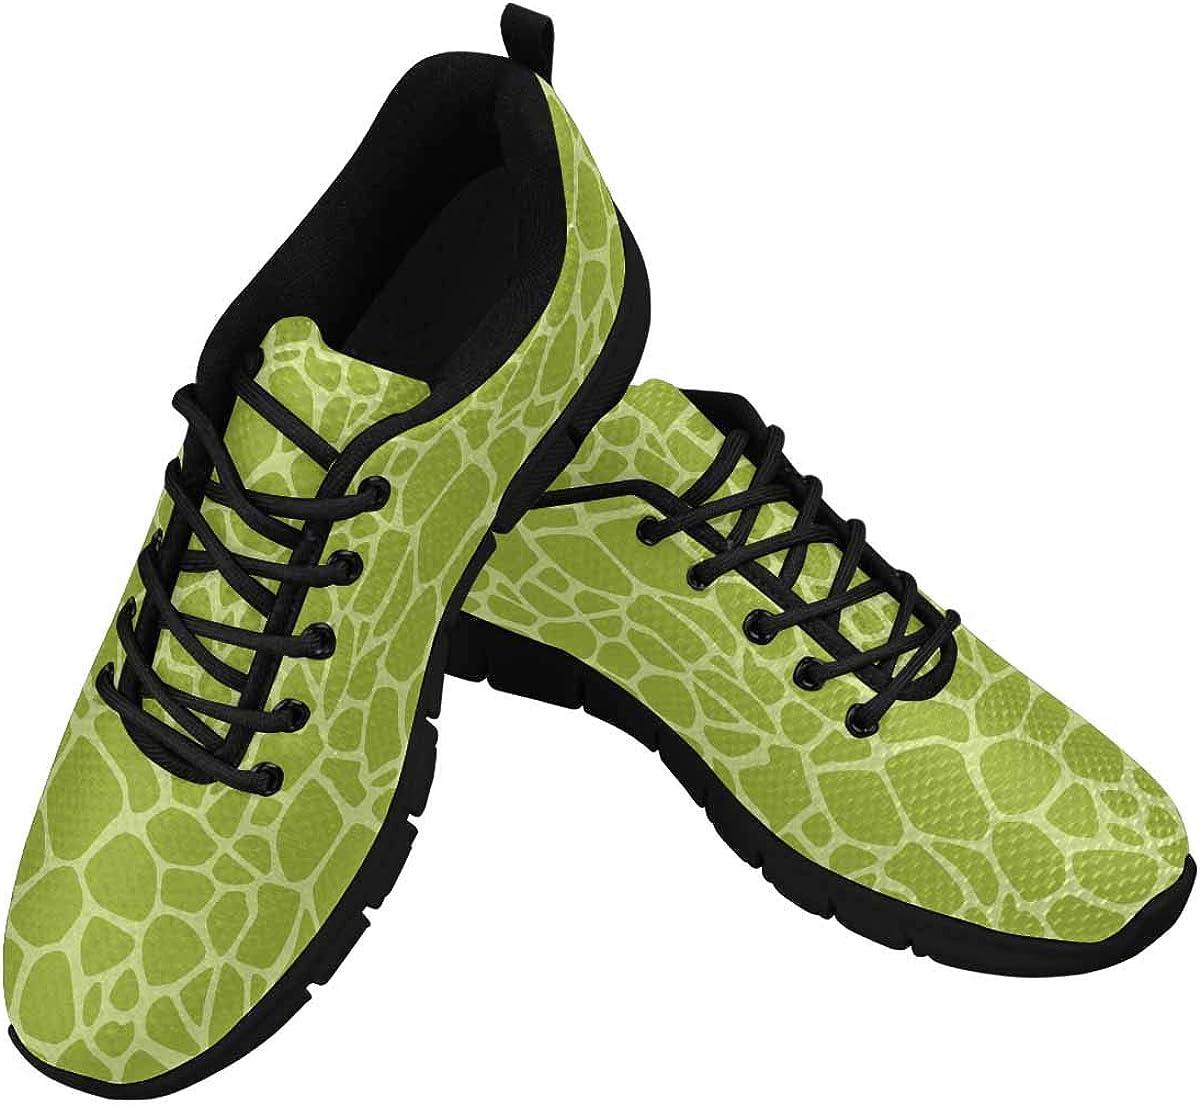 InterestPrint Green Dinosaurs Pattern Women's Lightweight Sneakers Mesh Breathable Yoga Shoes